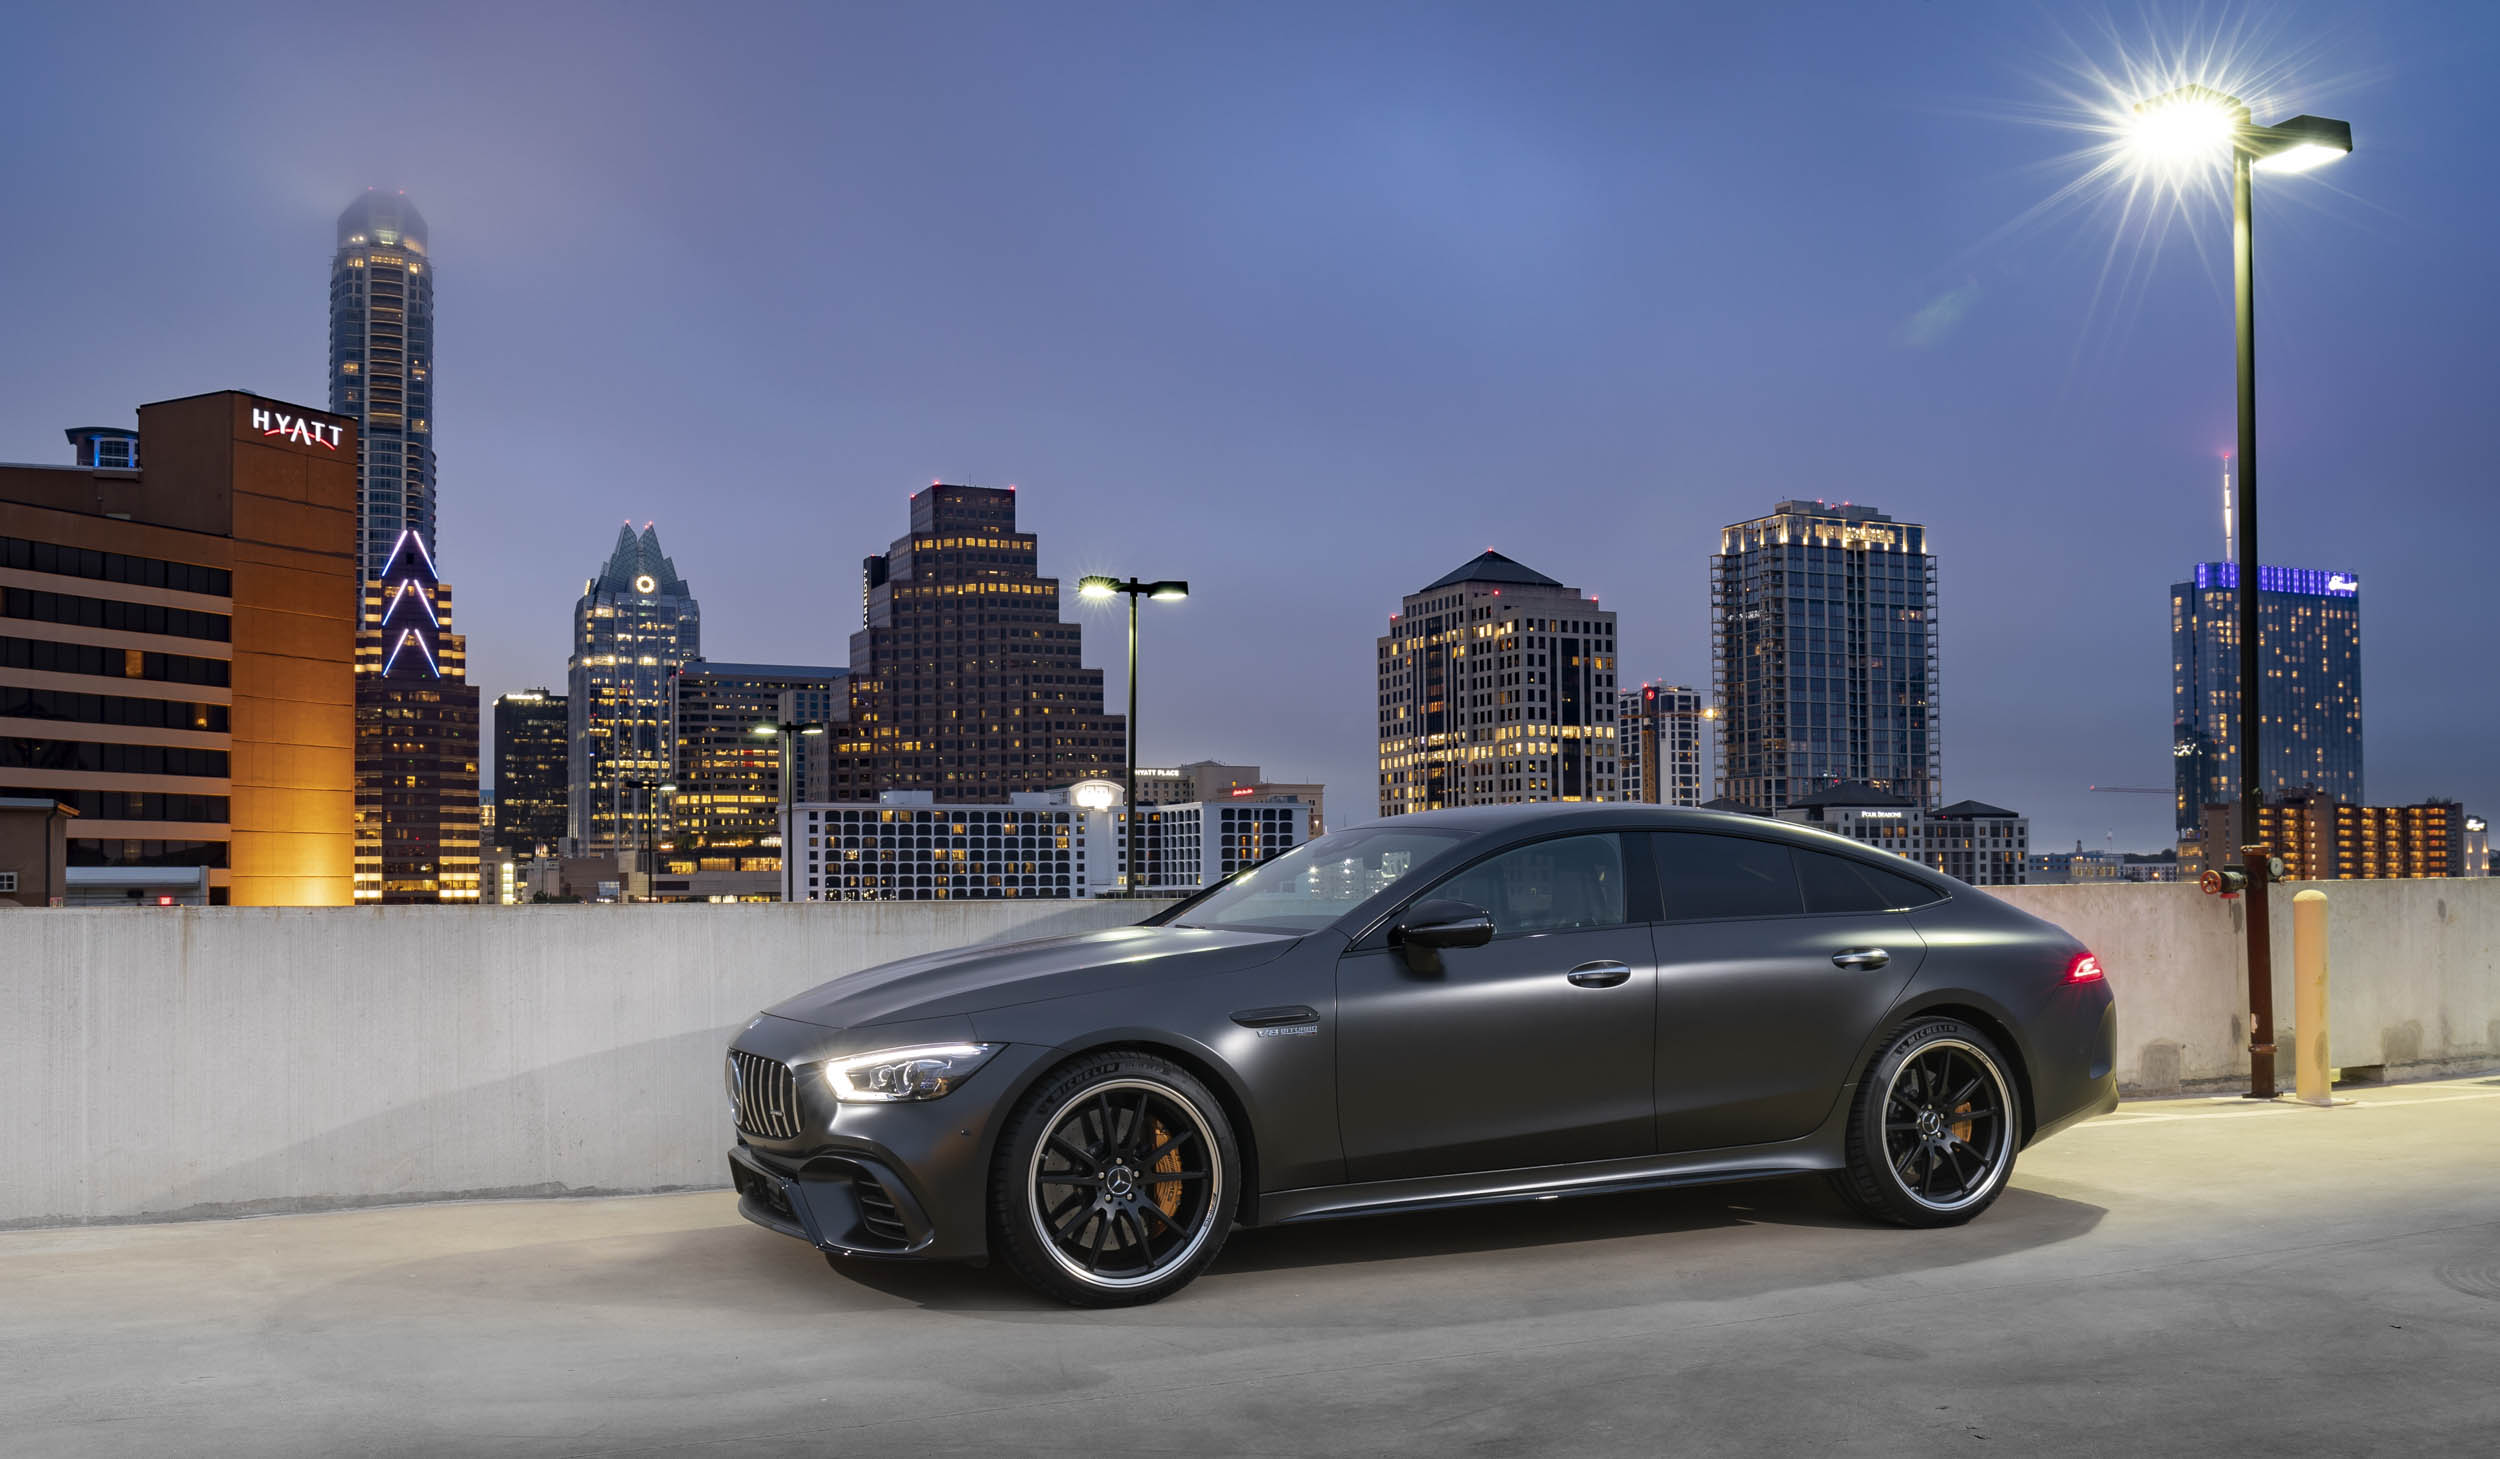 Mercedes-AMG GT 63 S skyline profile